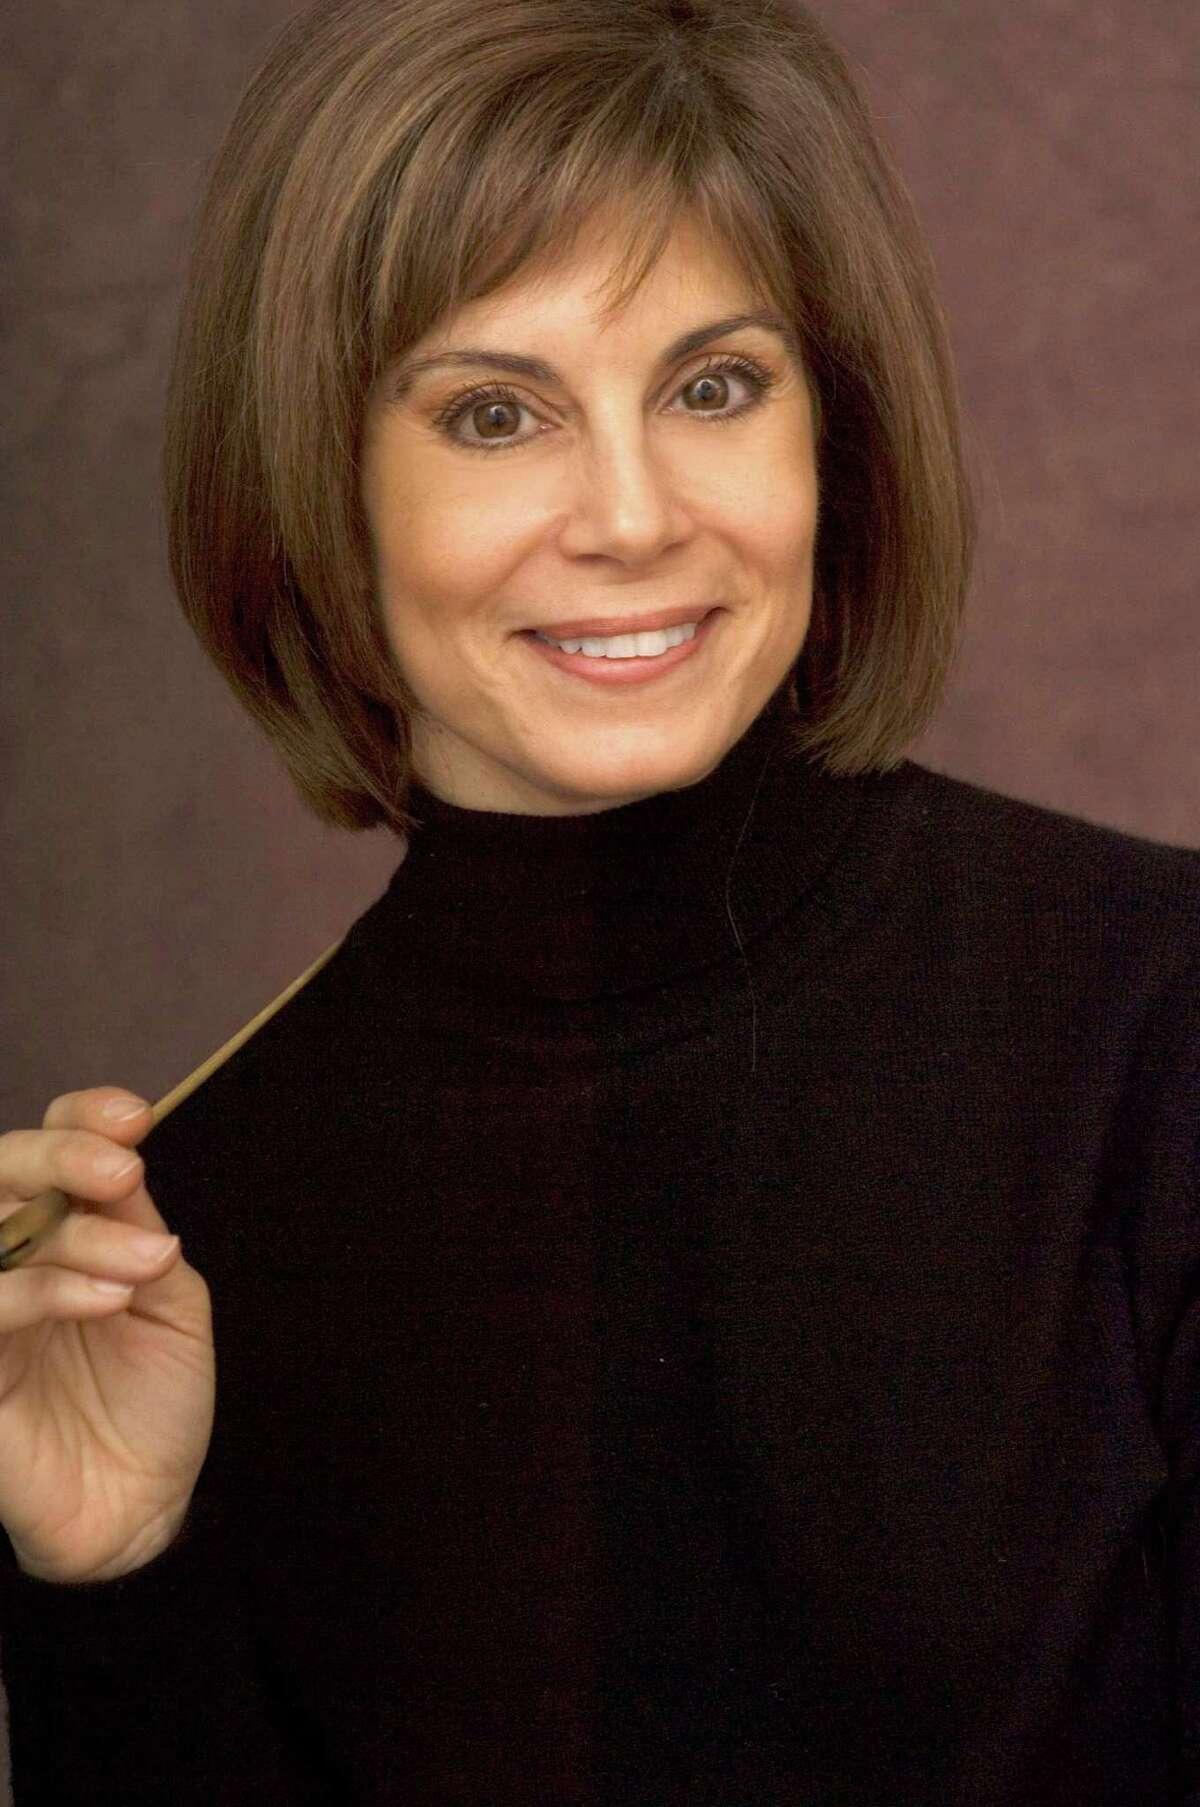 JoAnn Falletta (Mark Dellas)